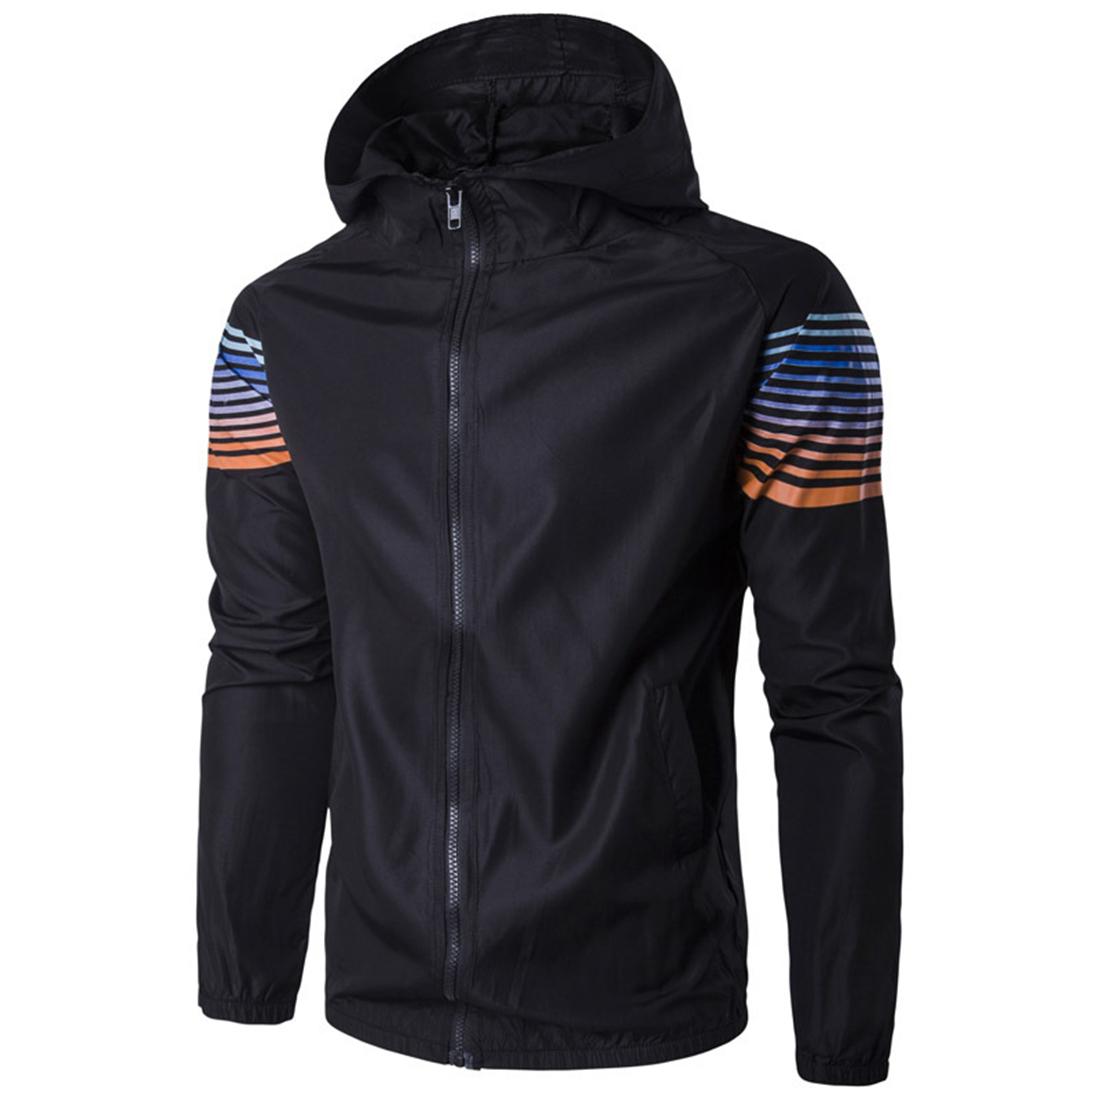 Popular Long Black and White Striped Jacket-Buy Cheap Long Black